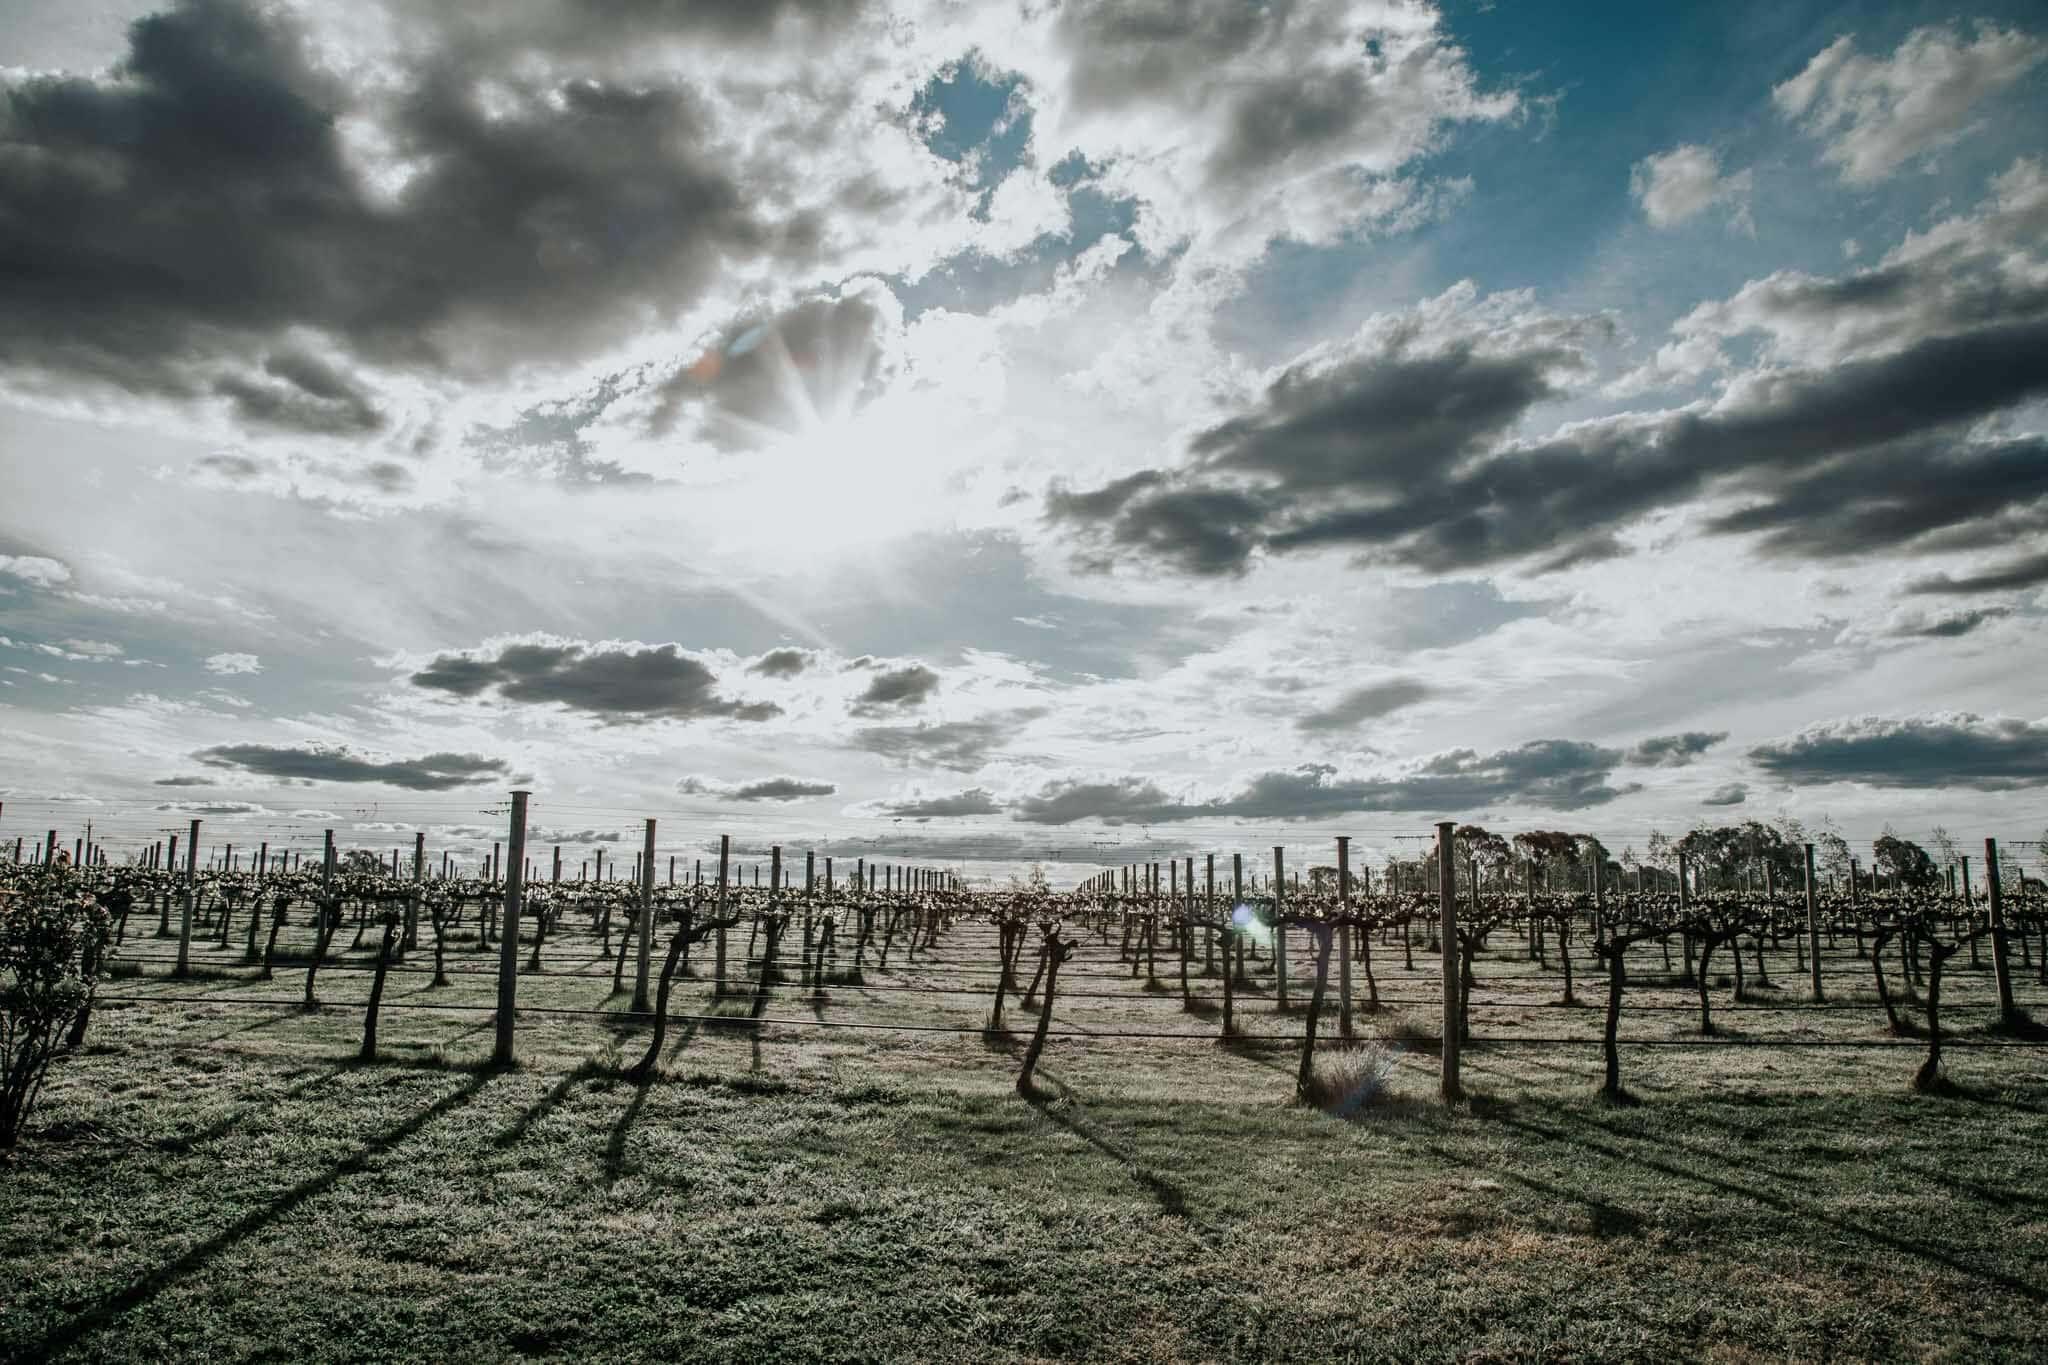 view of vines in orange australia.